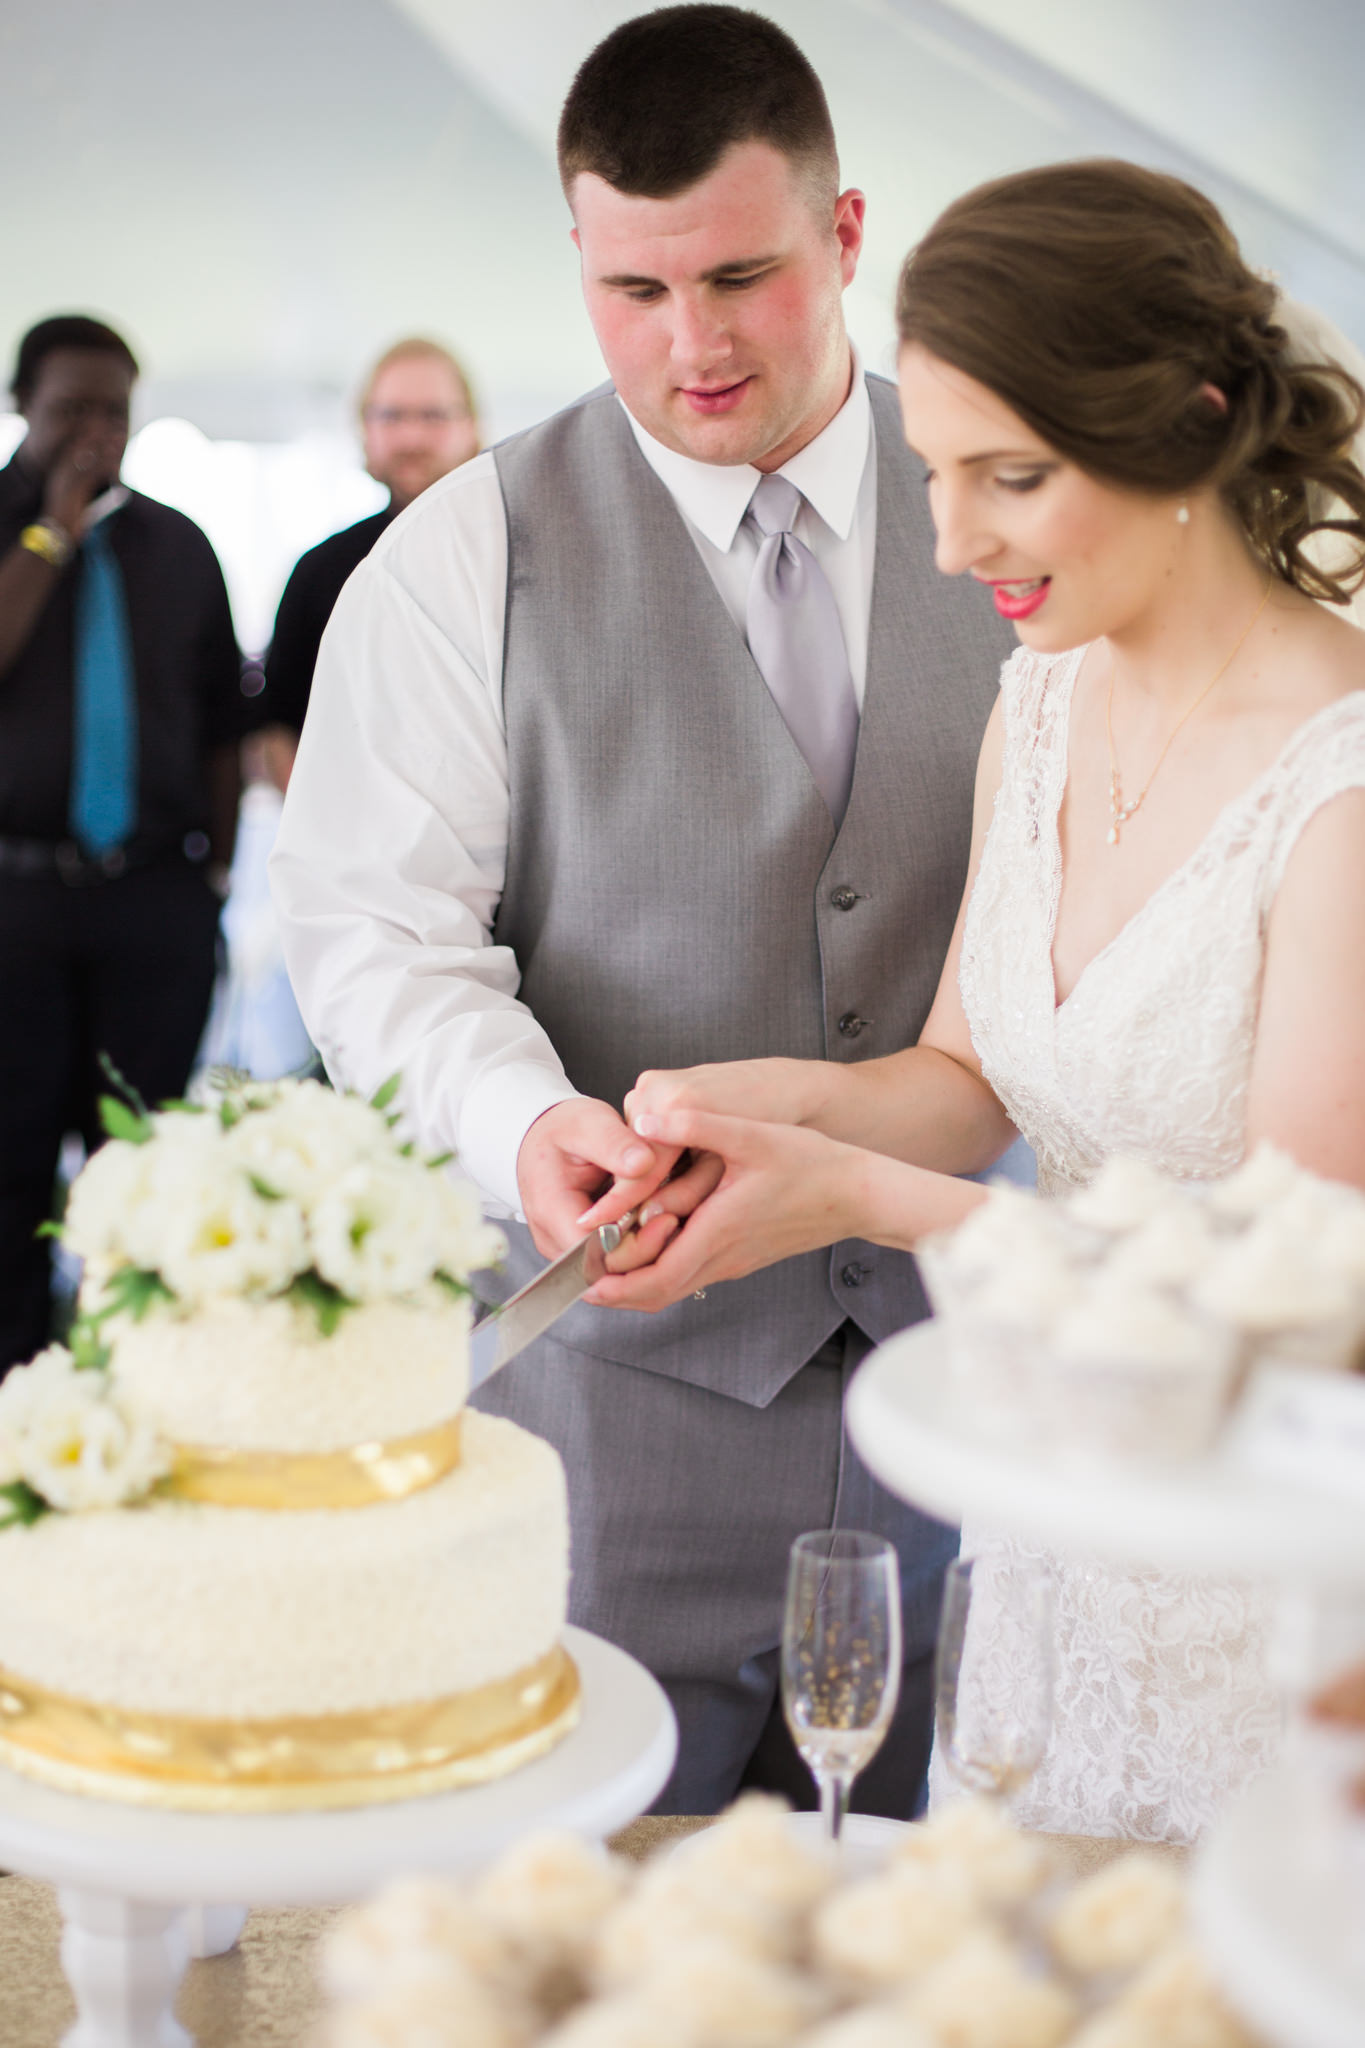 2017.06.03_Callie&Dustin_Wedding_Blog_0042.jpg